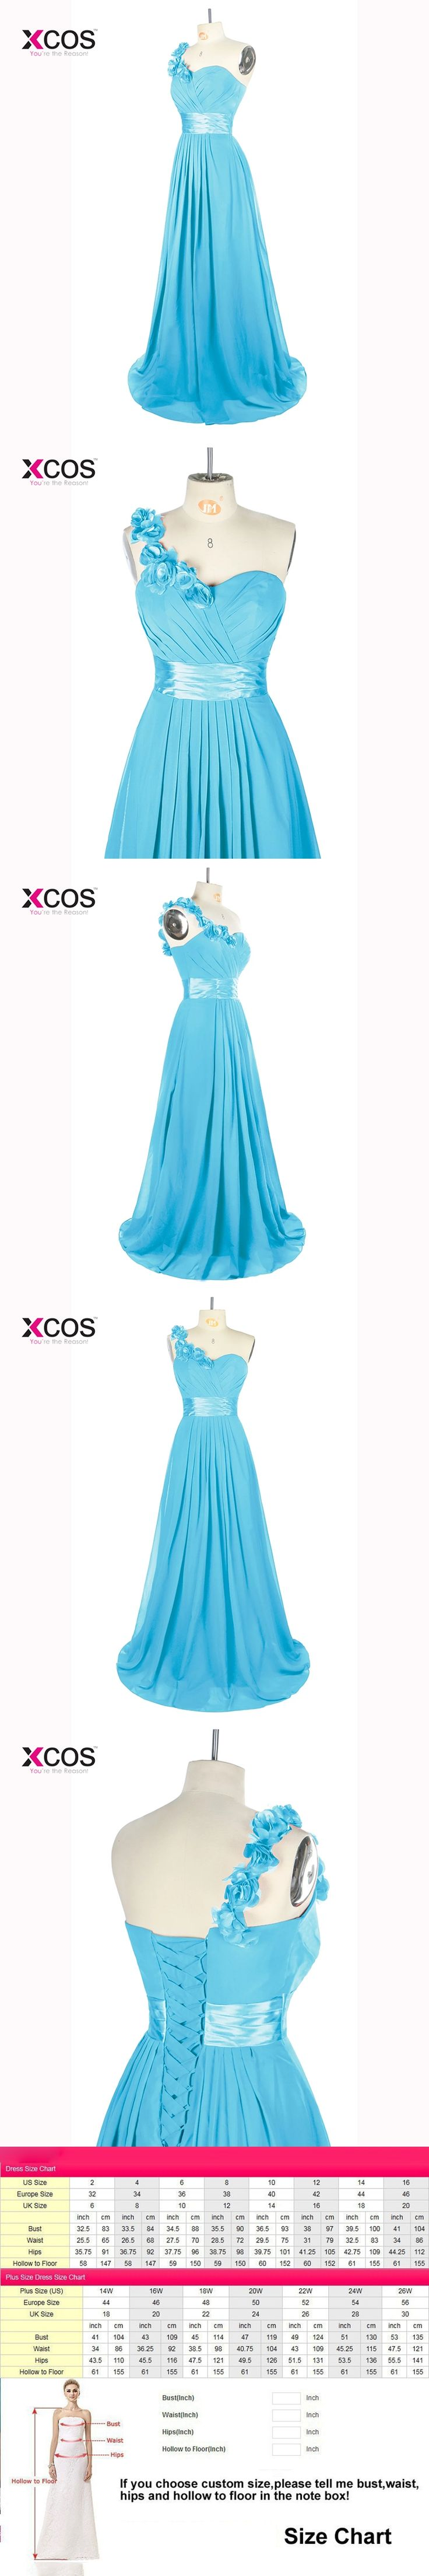 Blue One Shoulder Bridesmaid Dresses Long Flowers Beaded Chiffon Vestido Madrinha Longo Wedding Guest Dresses